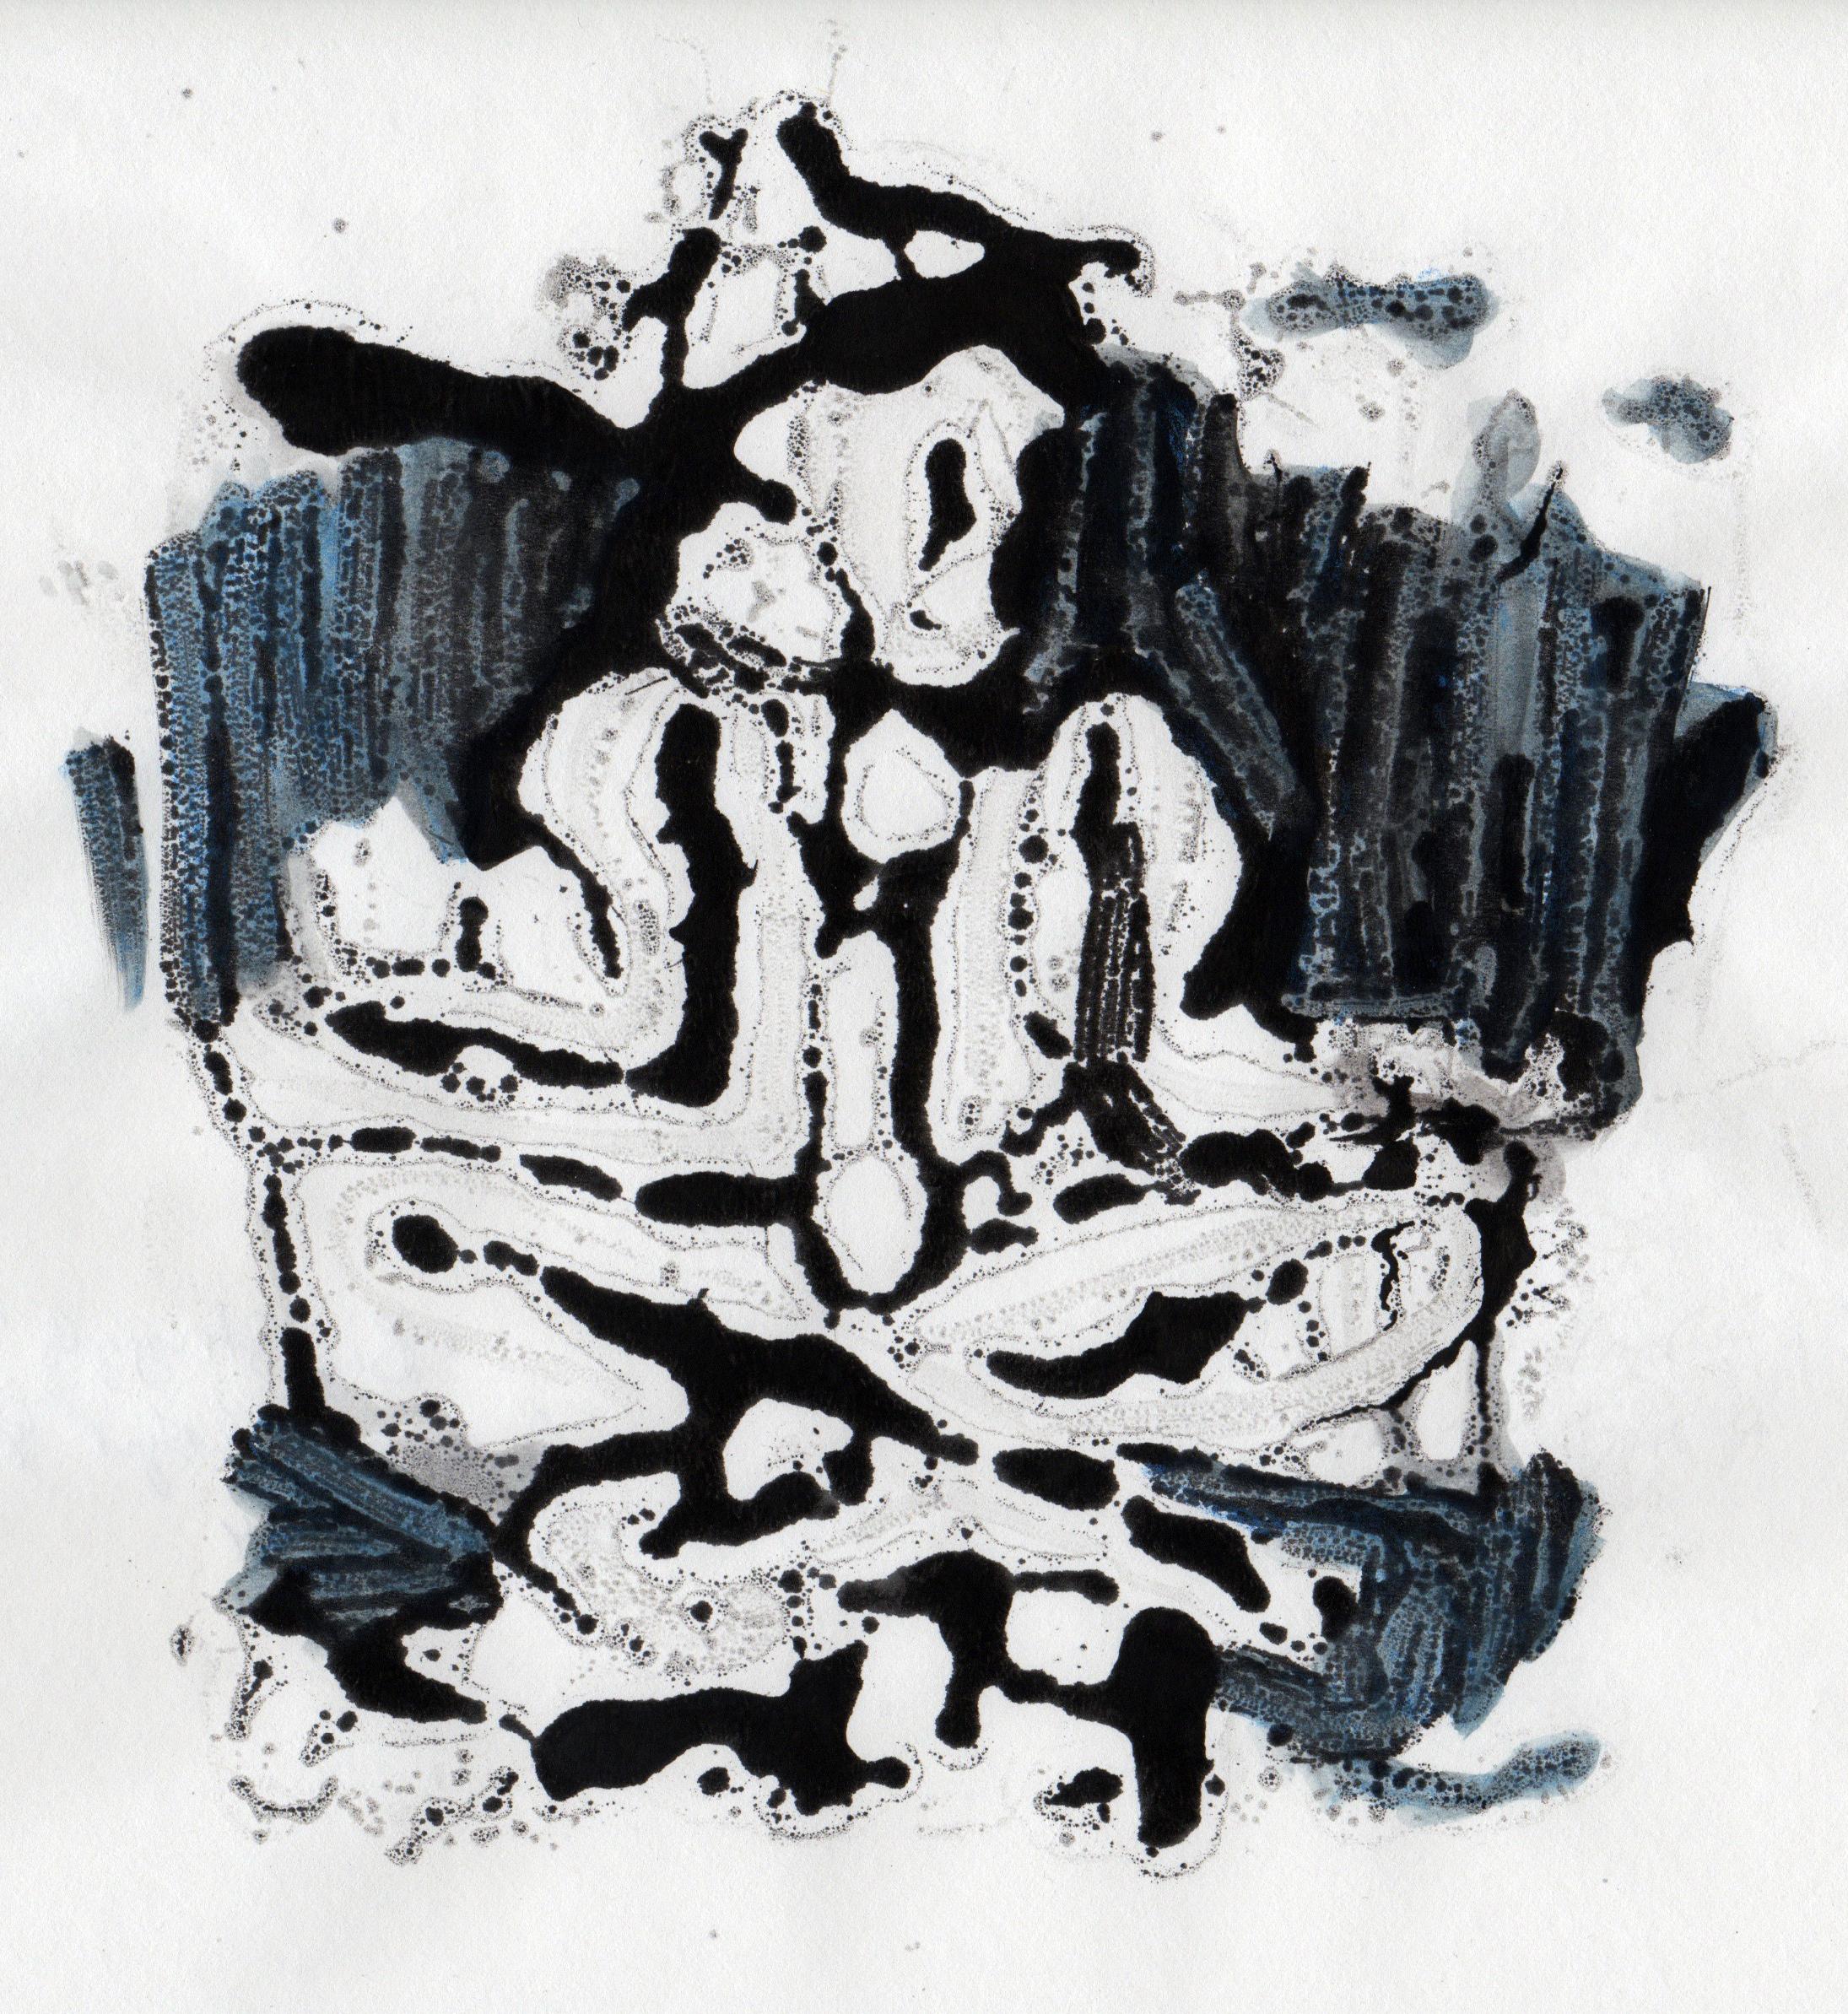 Big Struggle, 2014, hand colored gelatin monotype, 10x9 inches